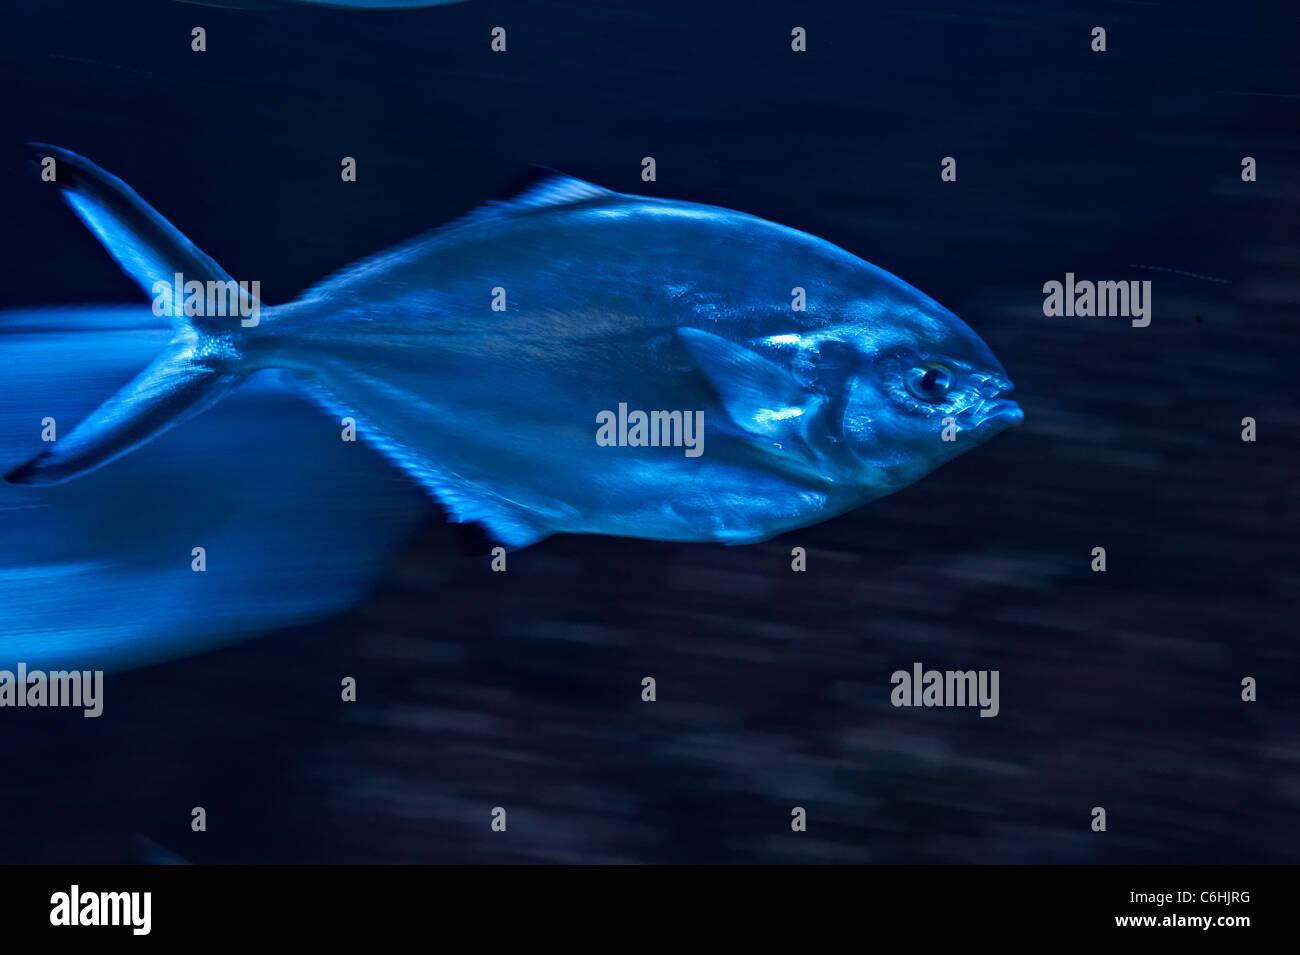 fish - Stock Image